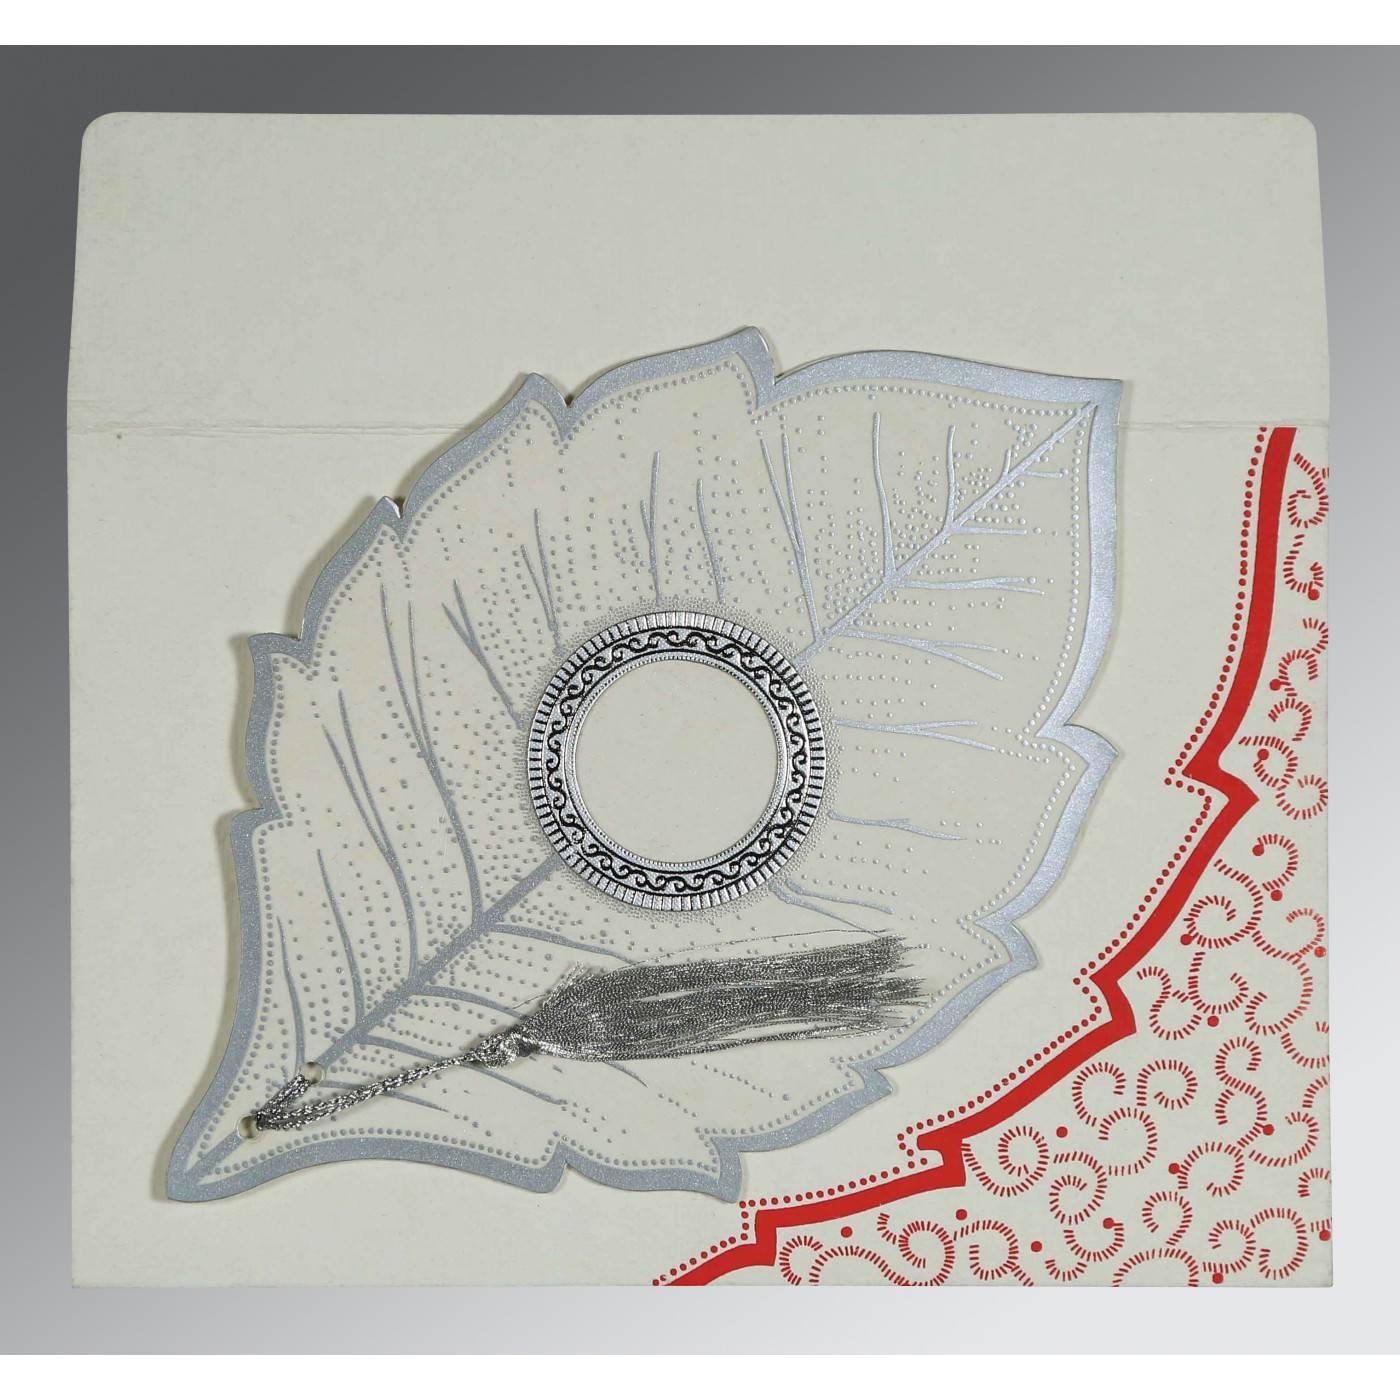 BEIGE HANDMADE COTTON FLORAL THEMED - FOIL STAMPED WEDDING CARD : CIN-8219L - IndianWeddingCards